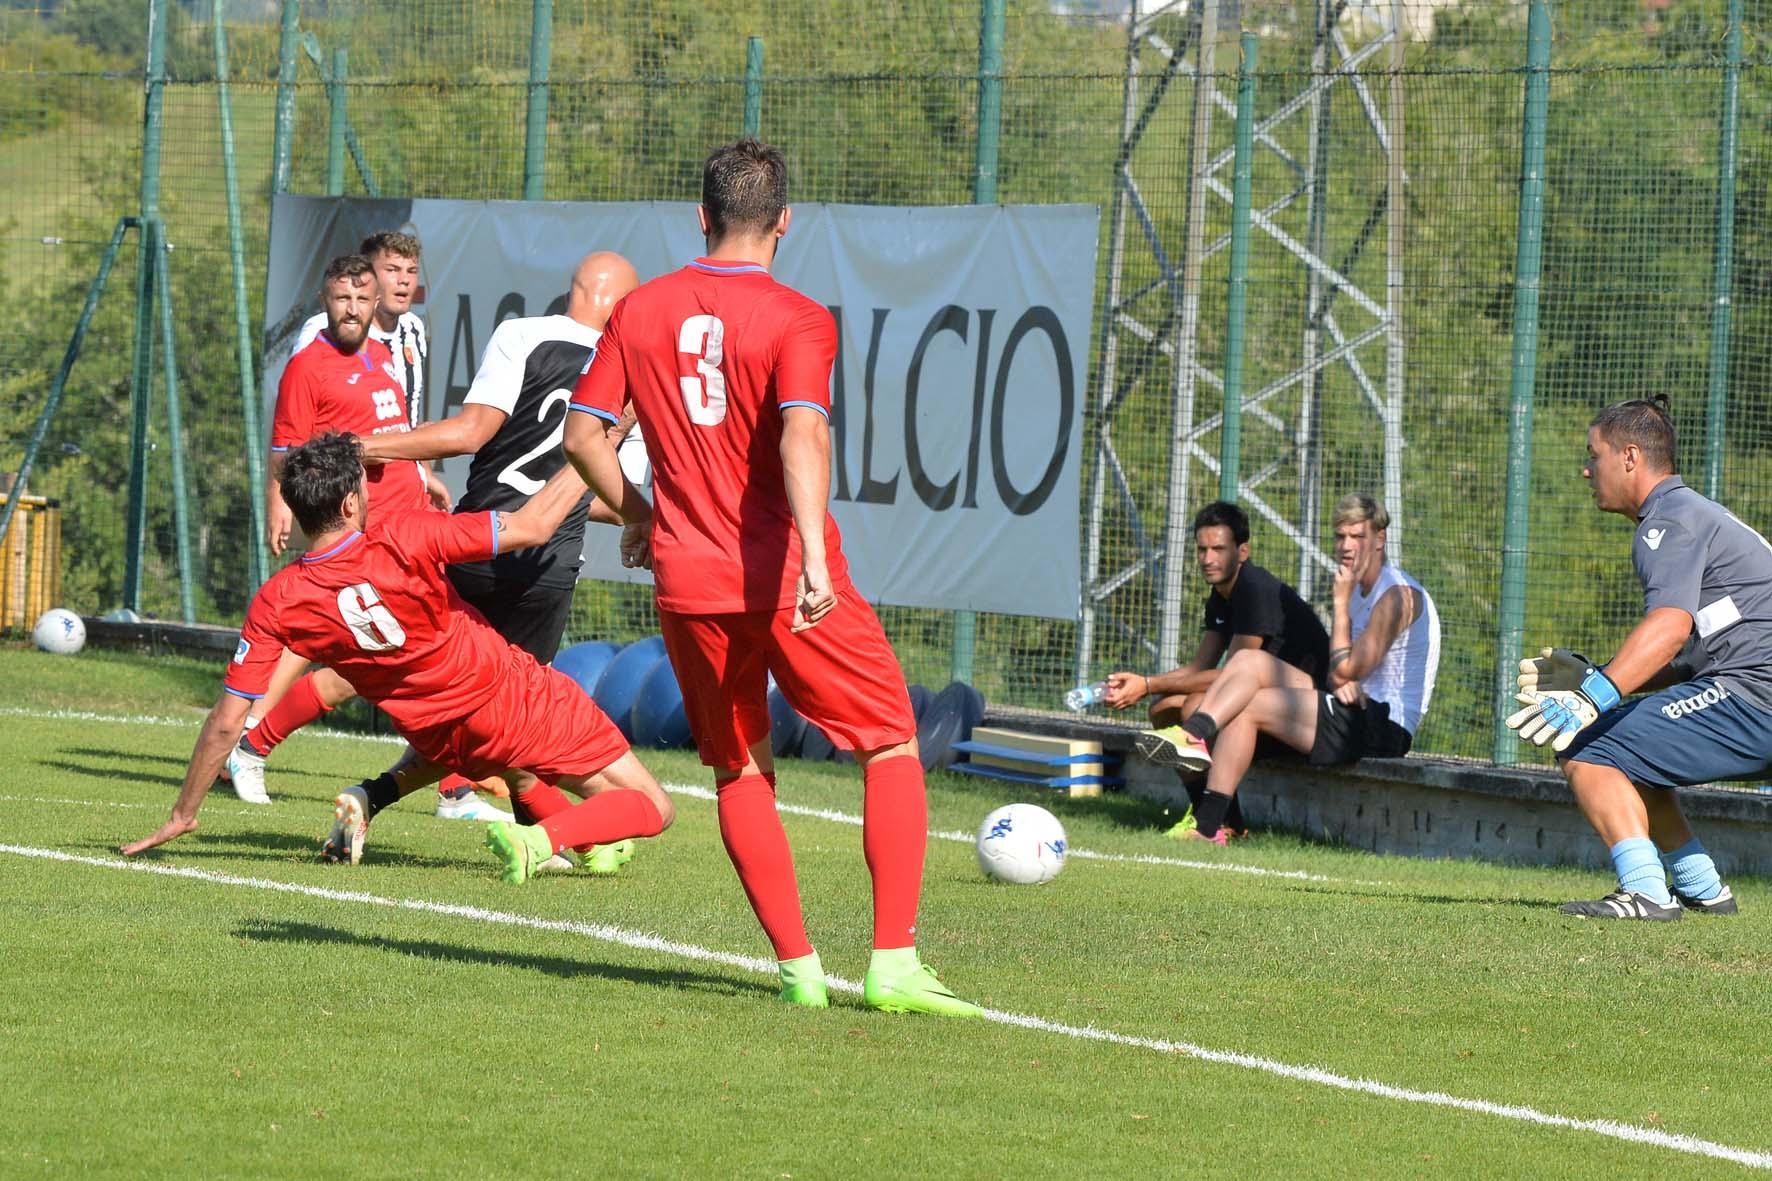 ascoli- atletico ascoli SANTINI in gol